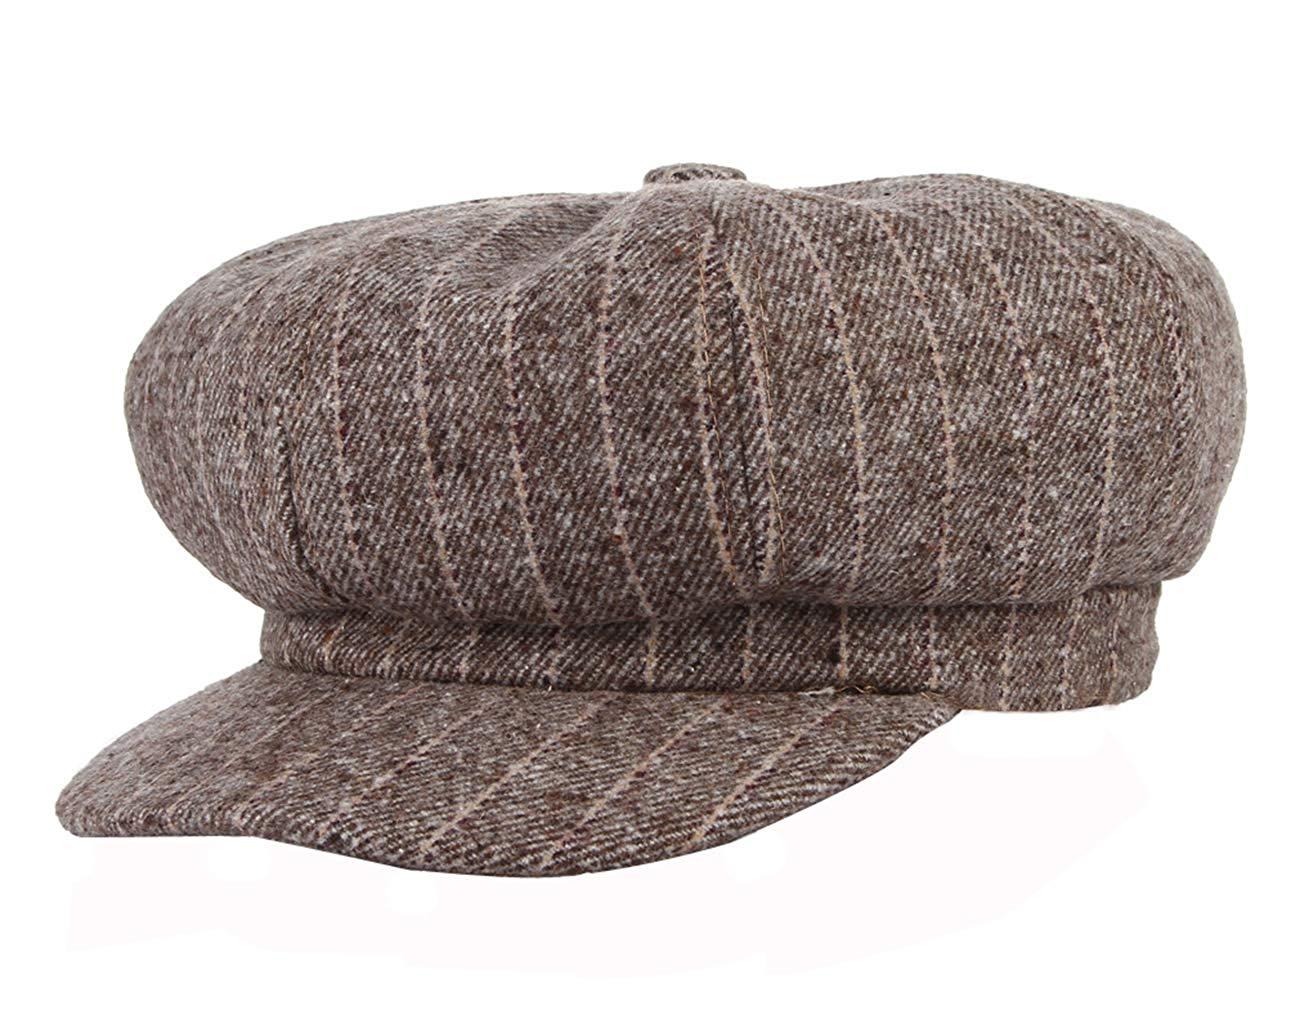 e6d690003febd Get Quotations · Gemvie Women s 8 Panel Striped Newsboy Hat Ladies Classic  Octagonal Baker Boy Hat Cap